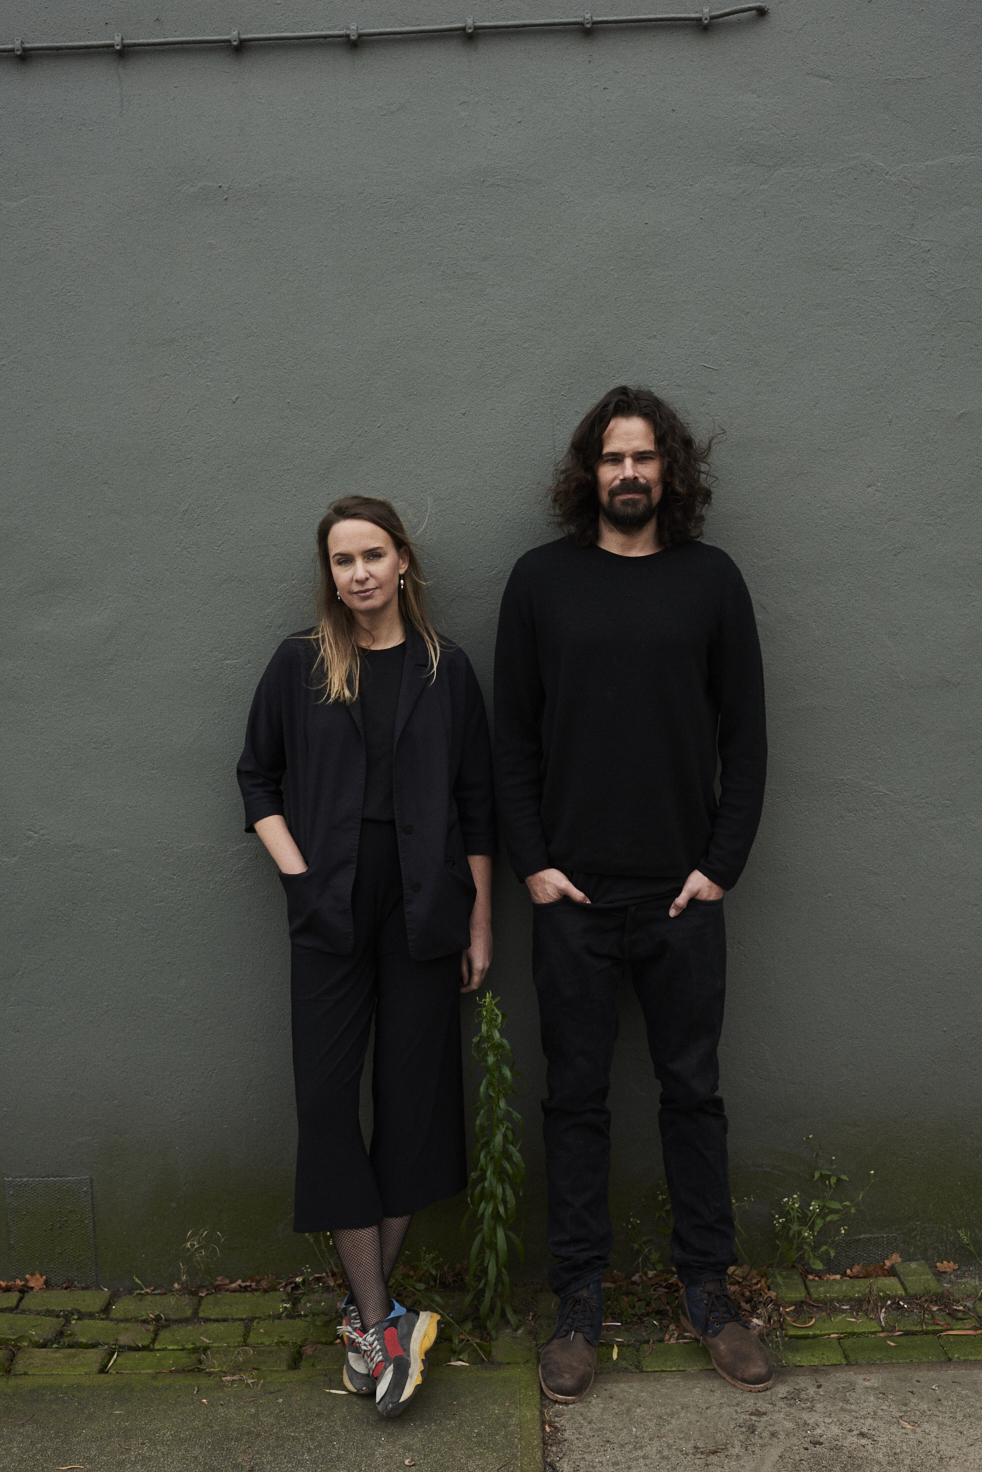 The duo Lonneke Gordijn and Ralph Nauta of DRIFT. Photo: Teska Overbeeke